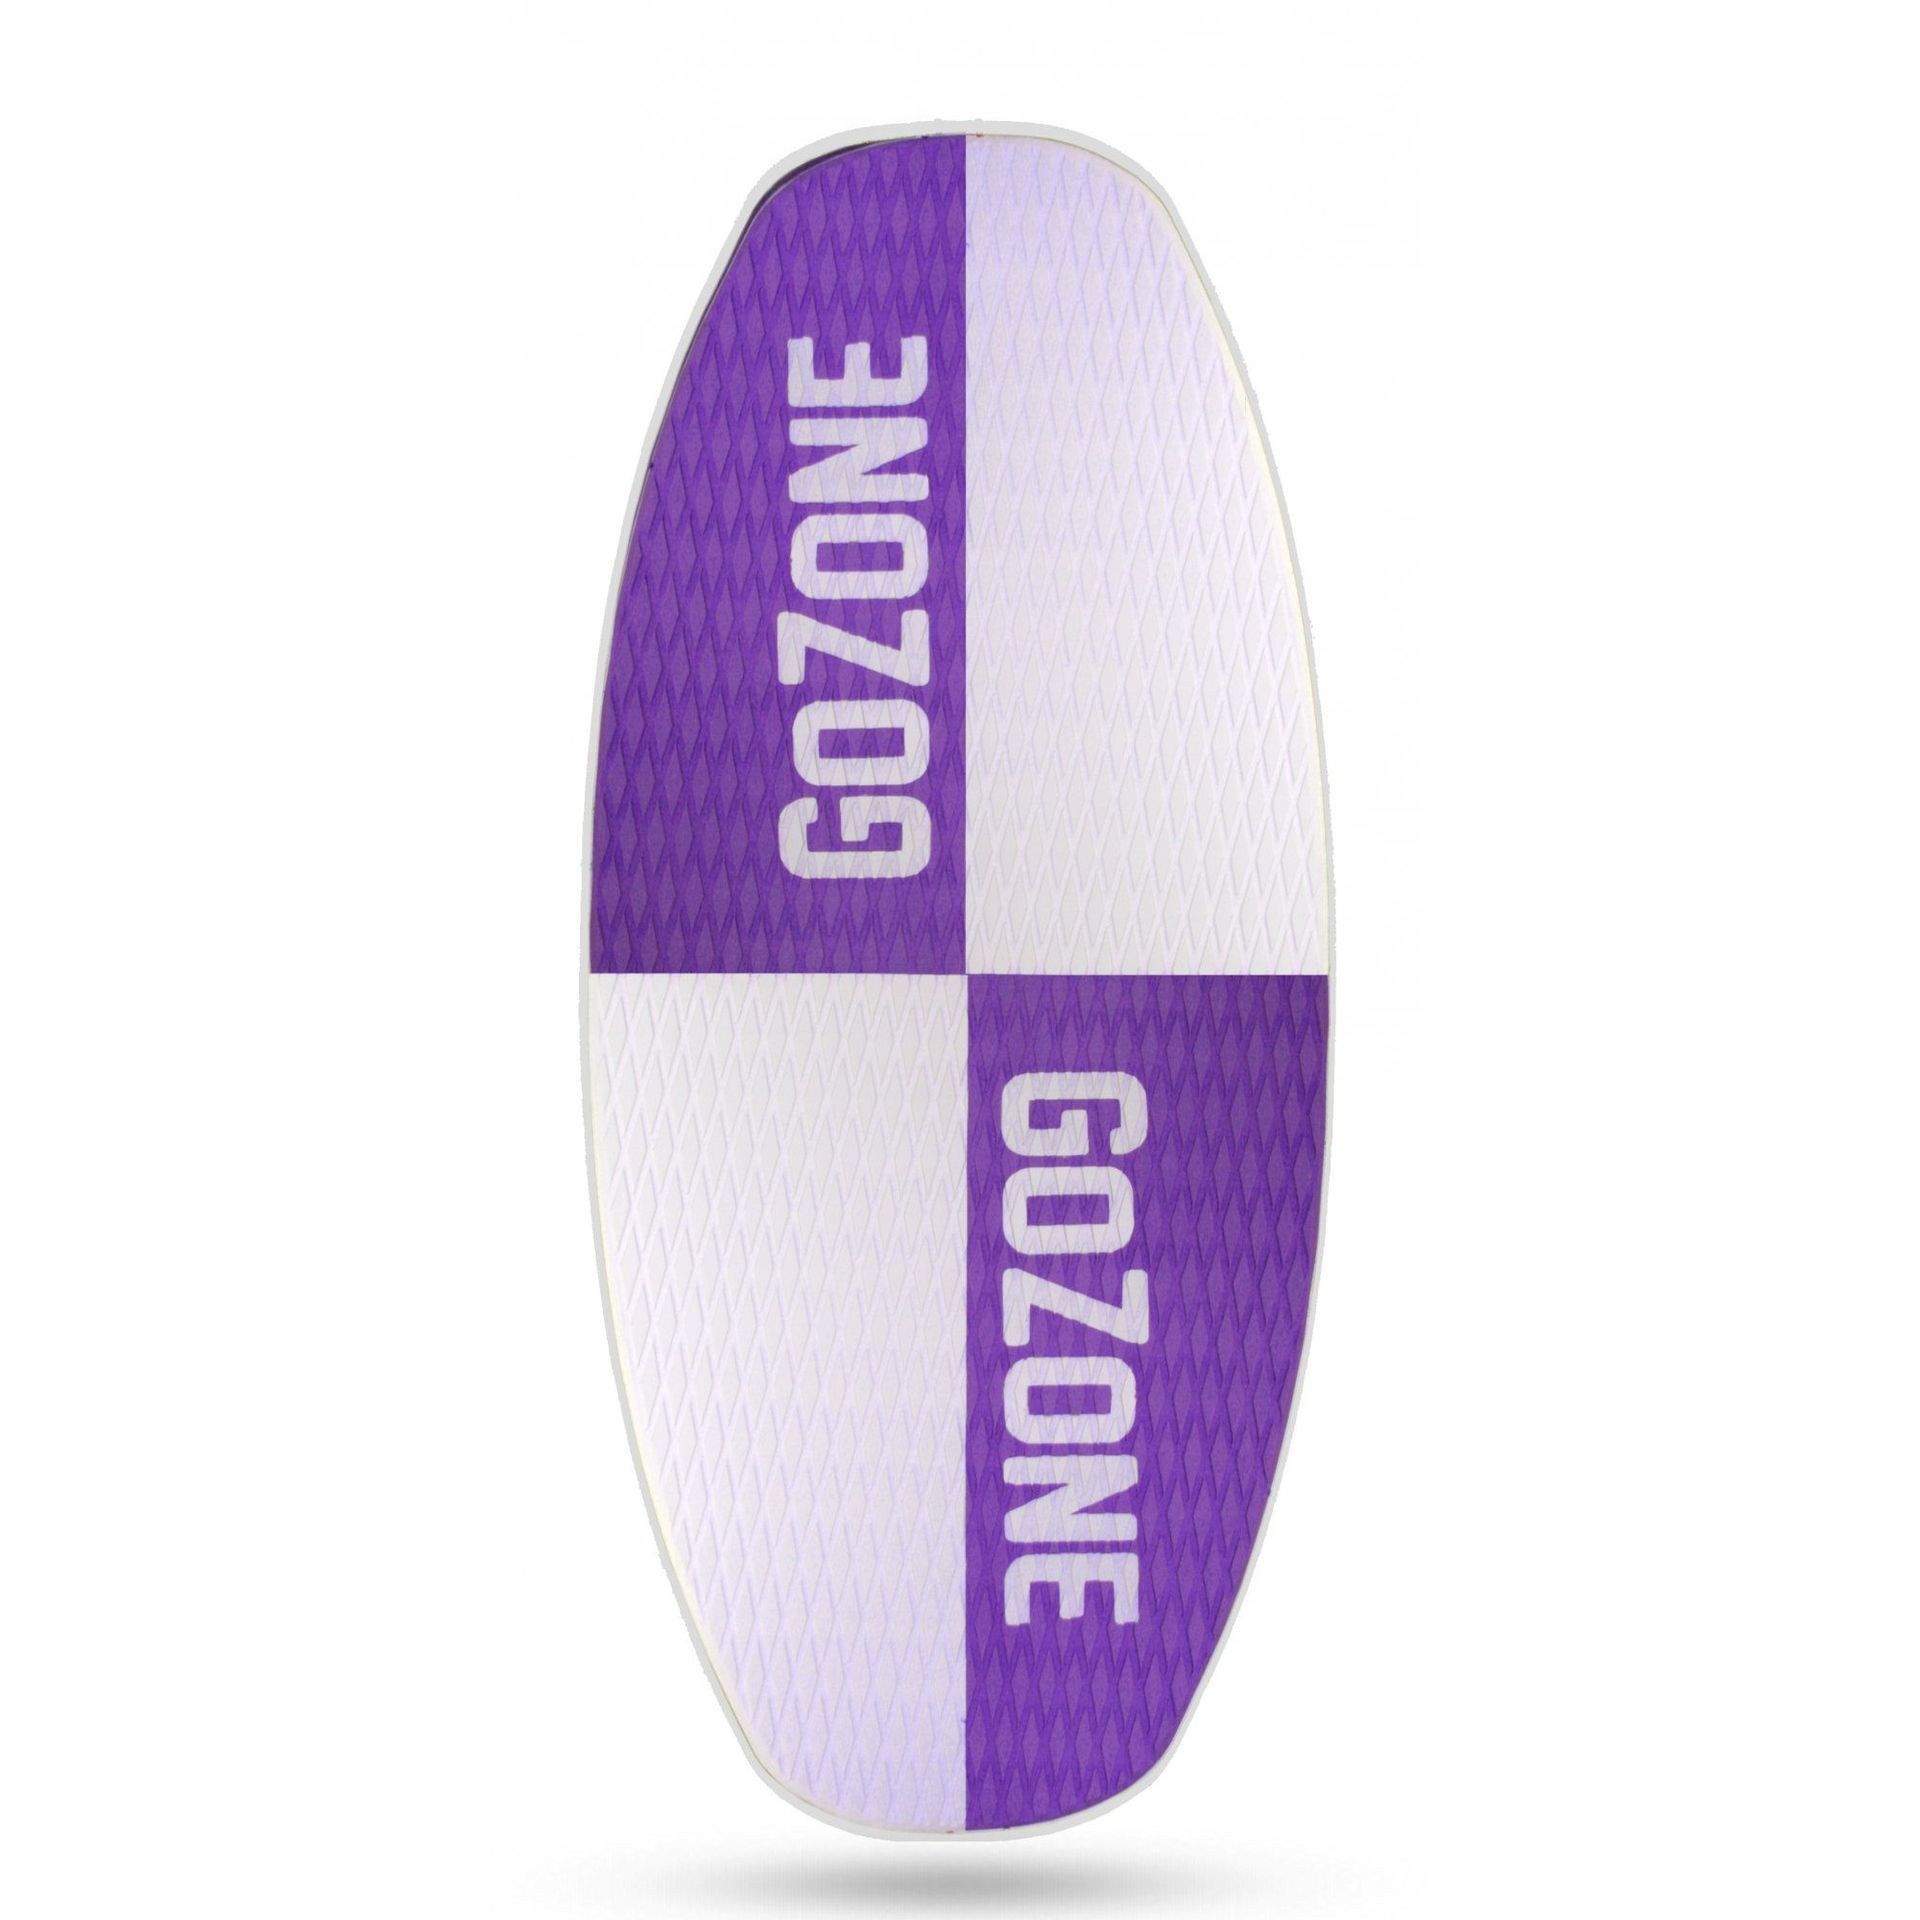 SKIMBOARD GOZONE PRO S WHITE|PURPLE